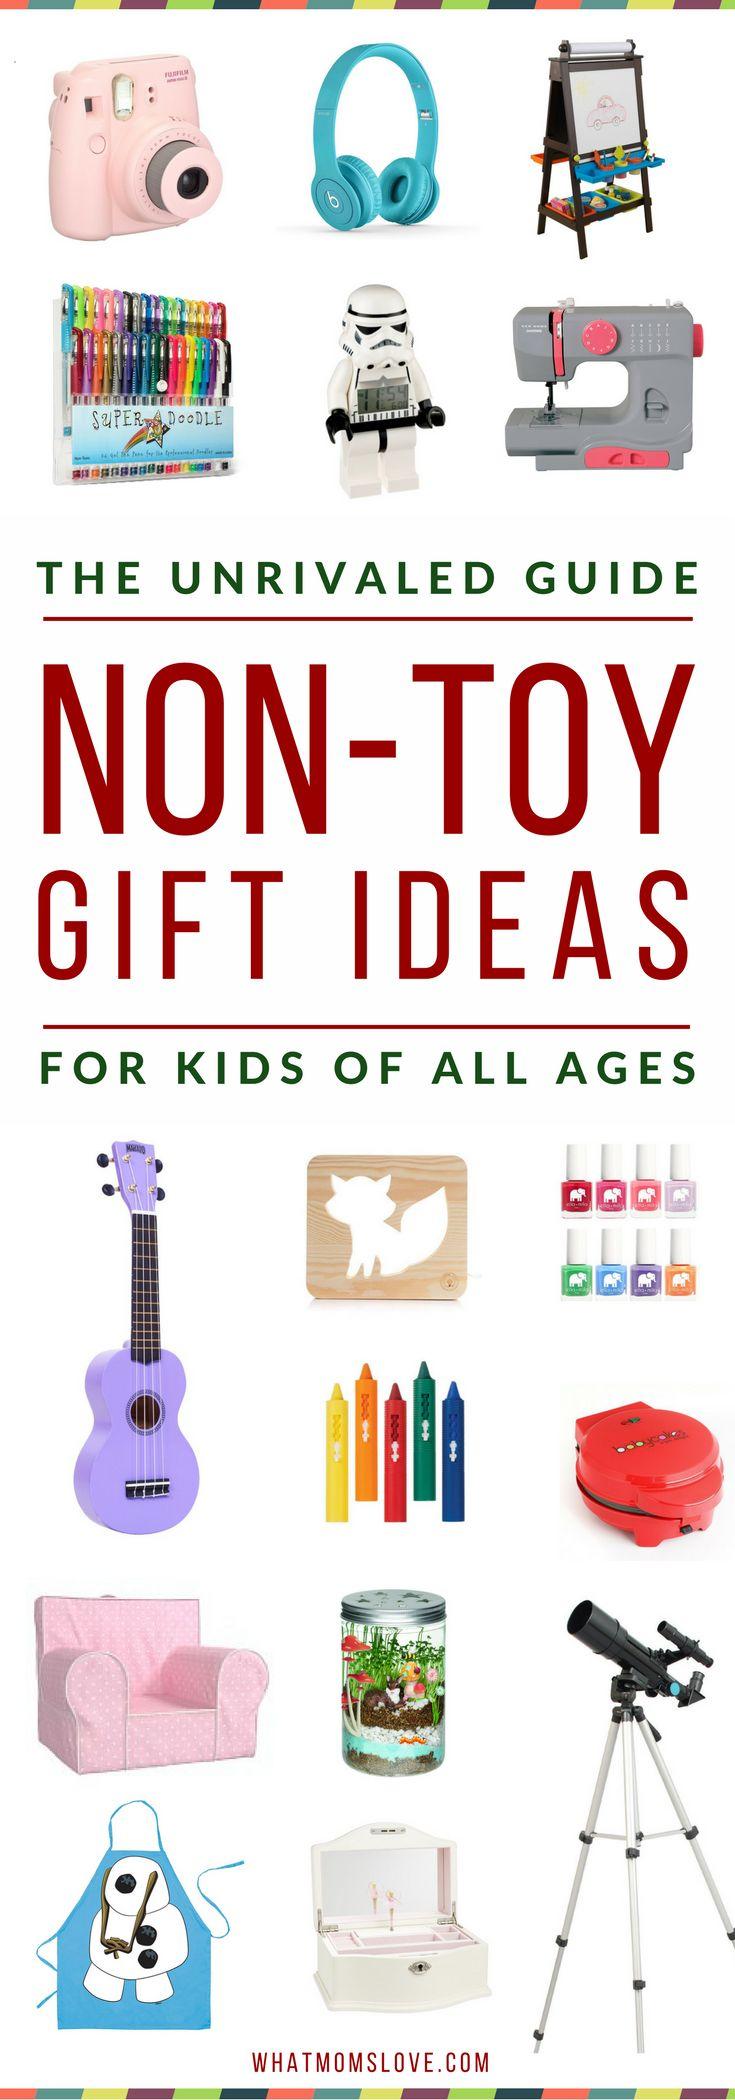 best life with babieskids images on pinterest crafts for kids